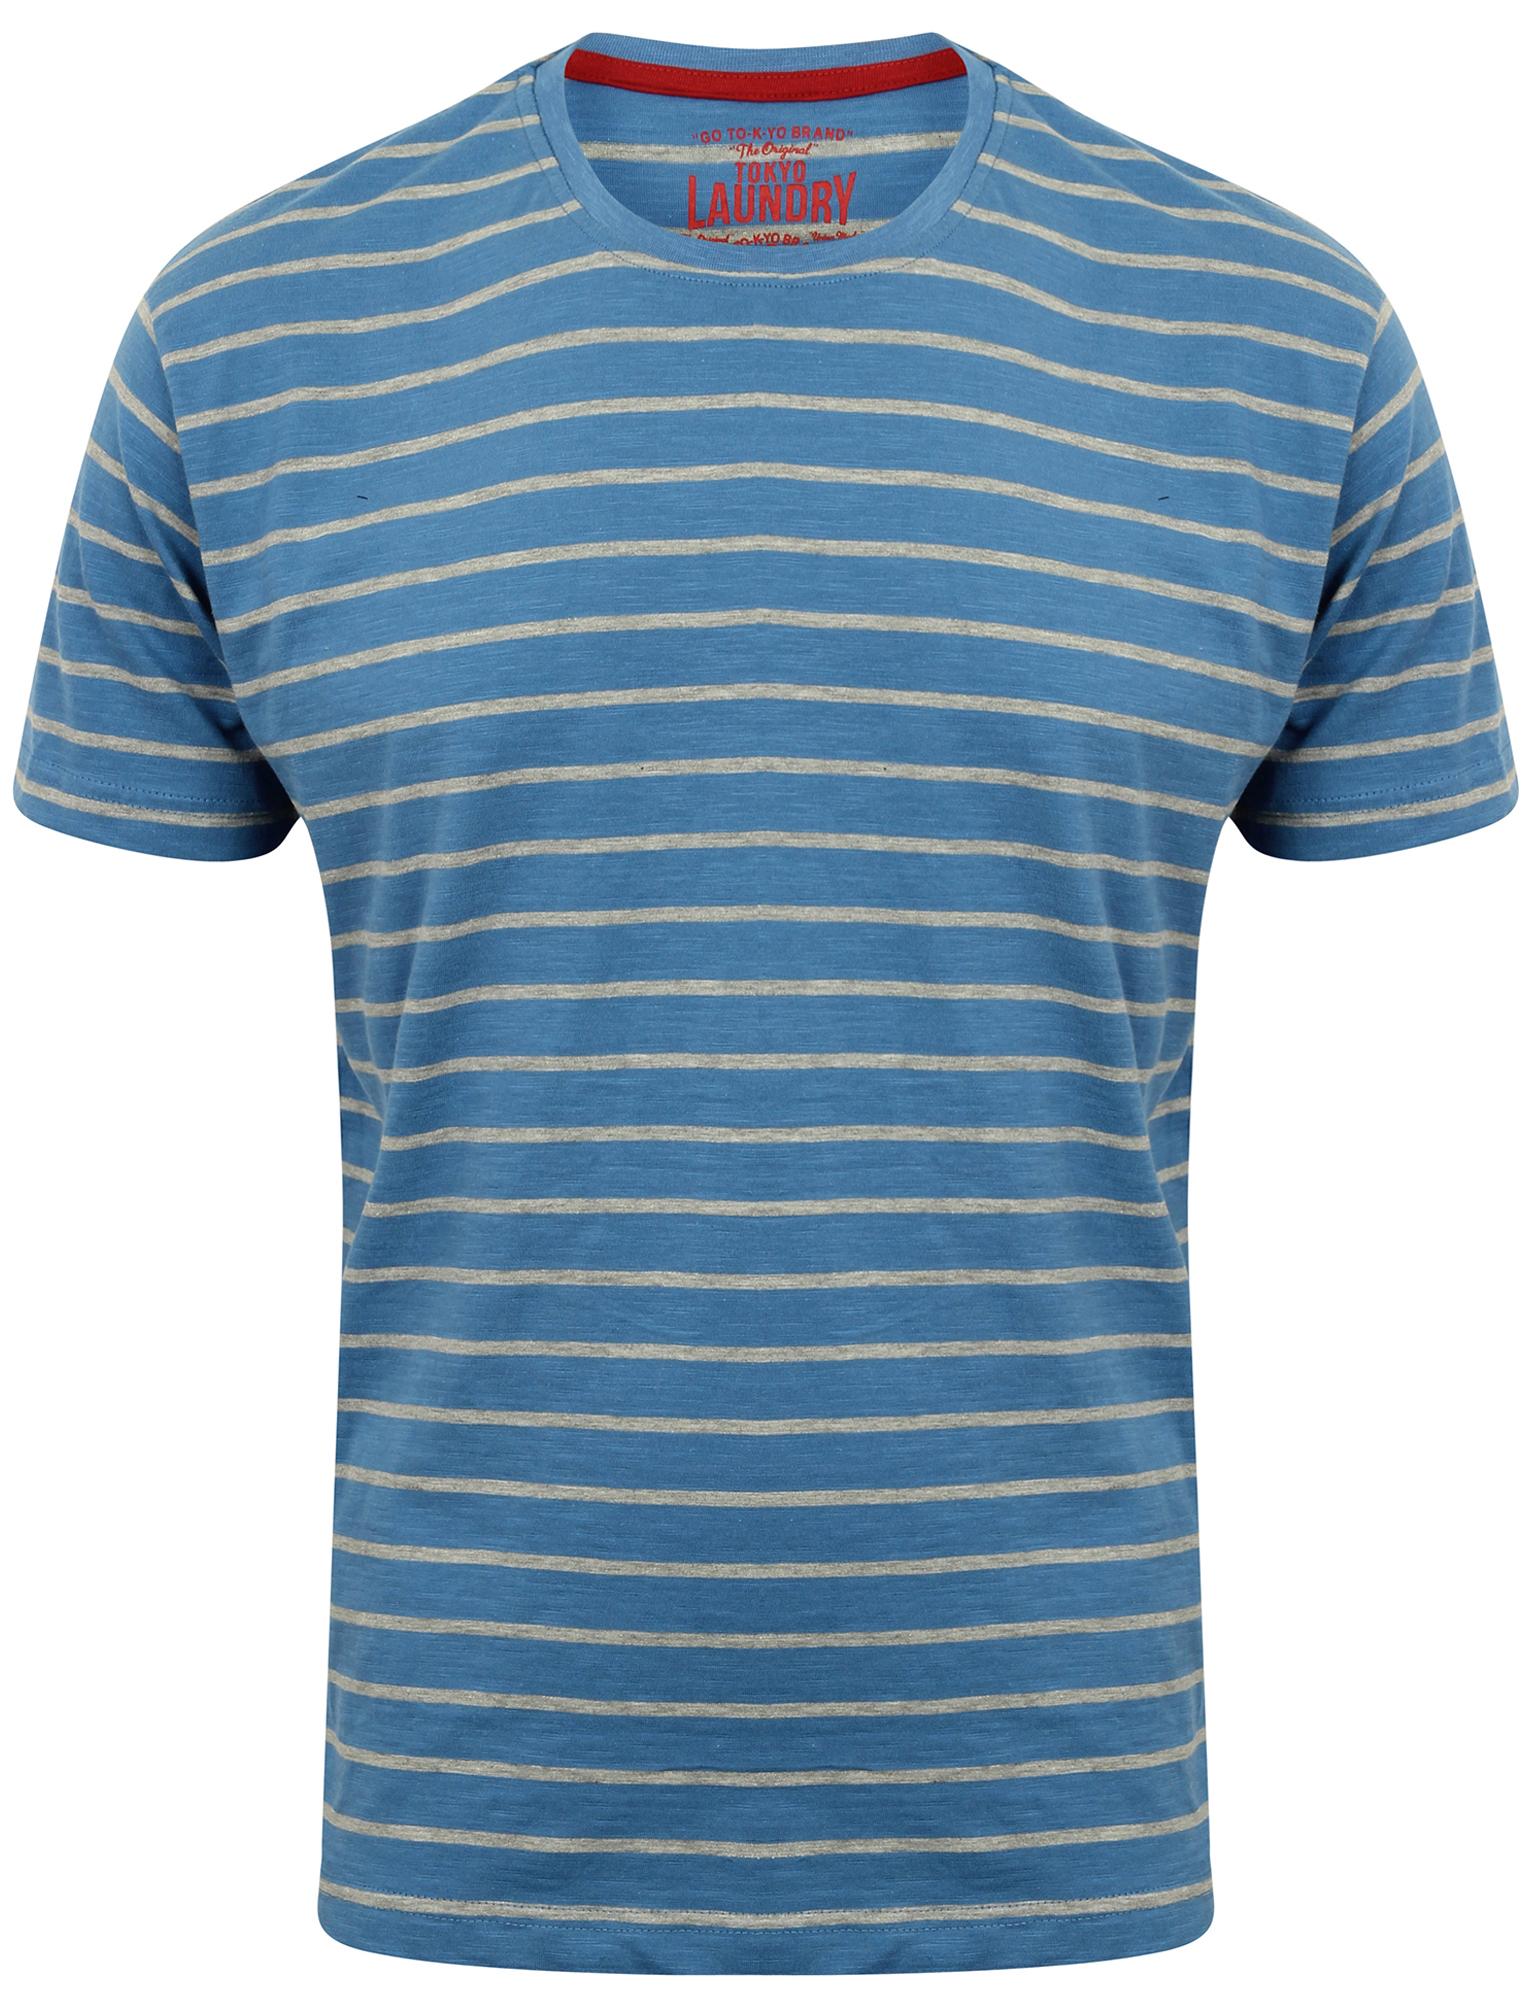 Tokyo-Laundry-Men-039-s-Gough-Cotton-Short-Sleeve-Pyjamas-PJ-Shorts-Lounge-Wear-Set thumbnail 8